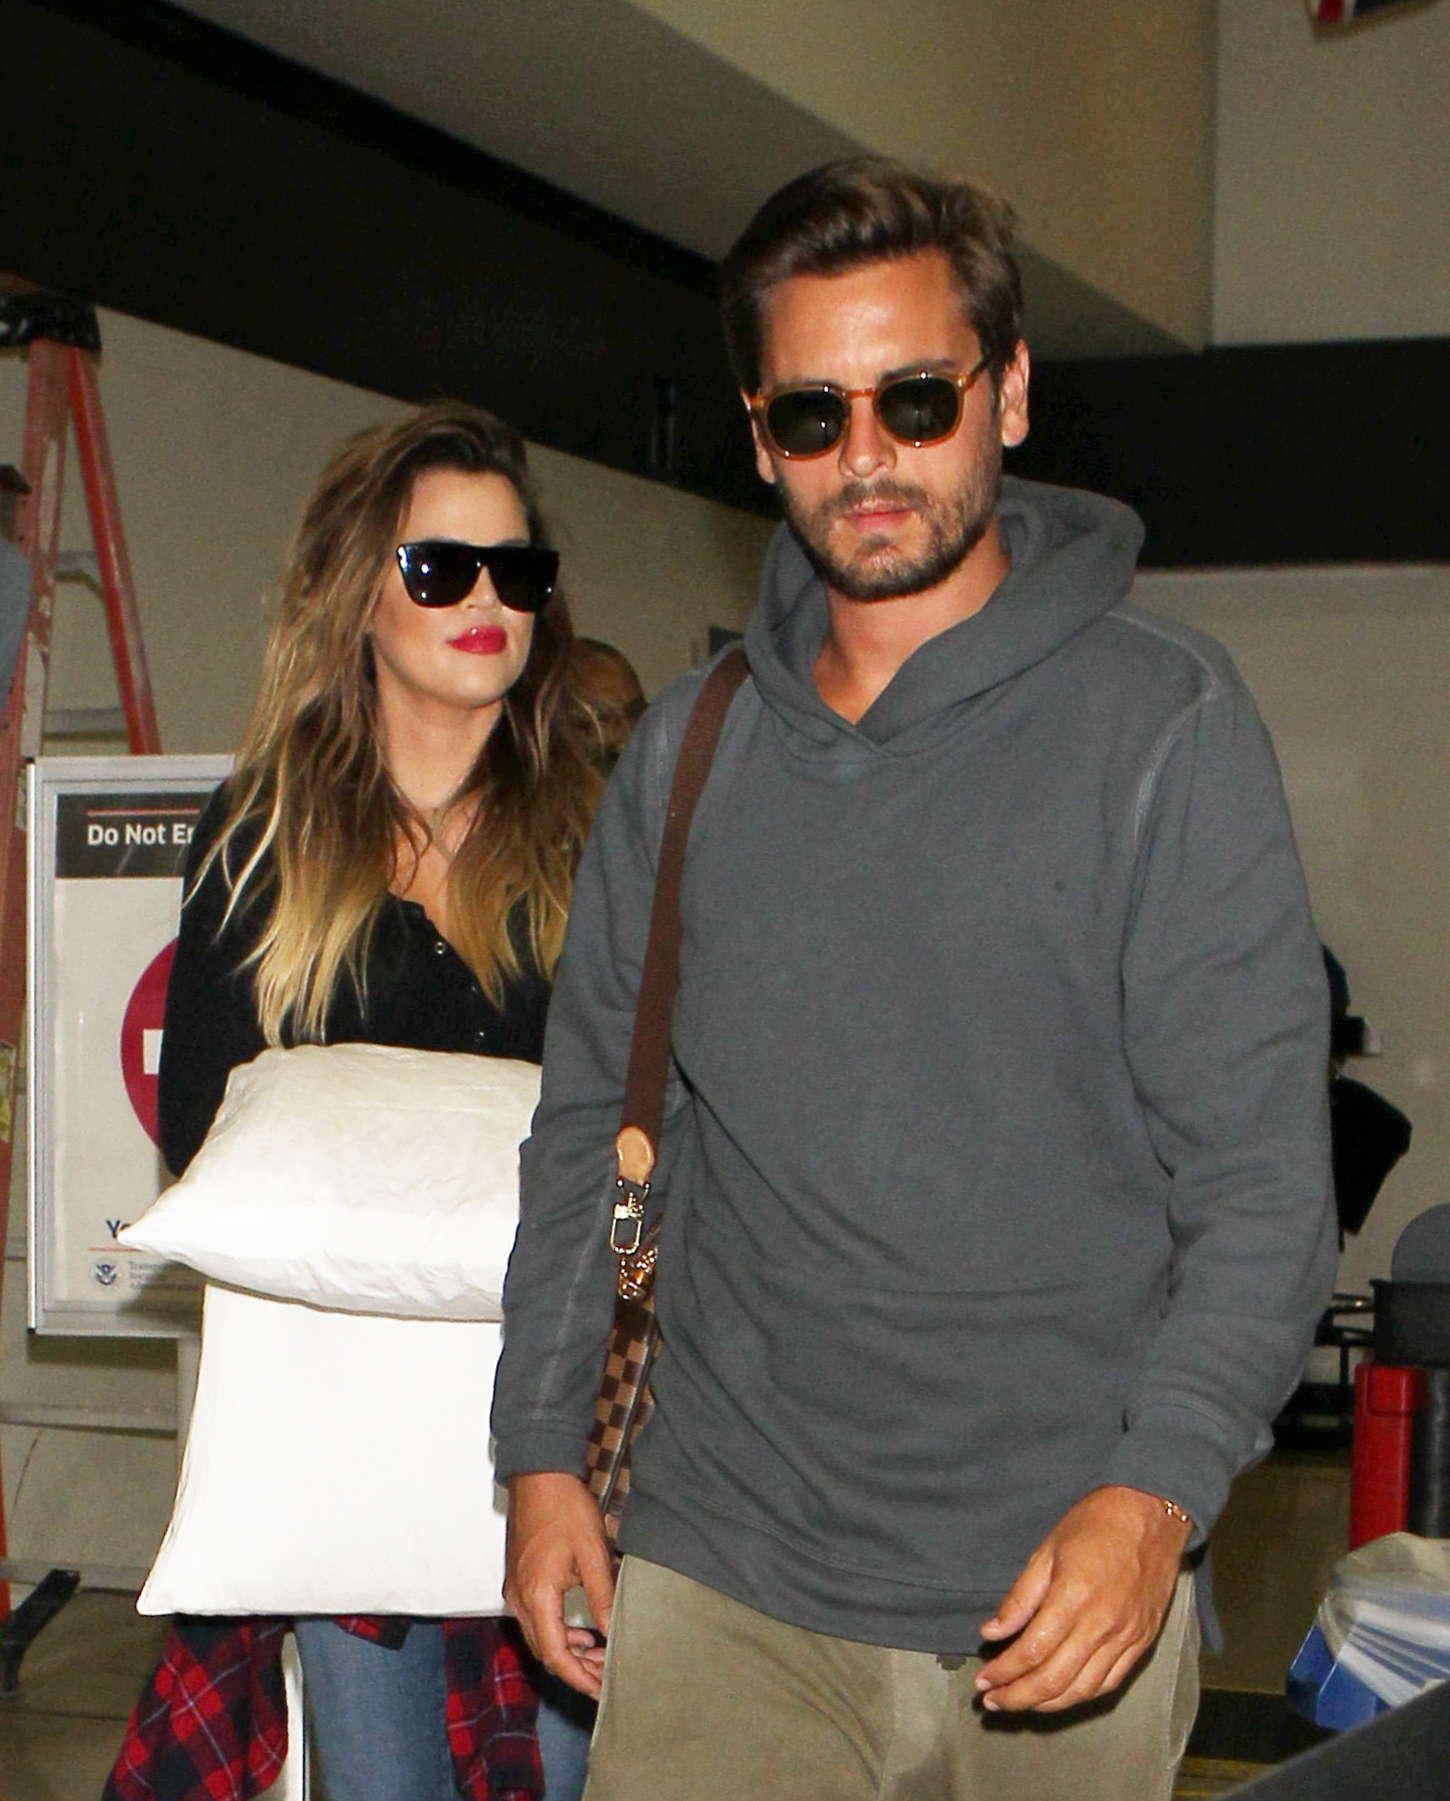 Khloe Kardashian 2014 : Khloe Kardashian with Scott Disick at LAX airport -04